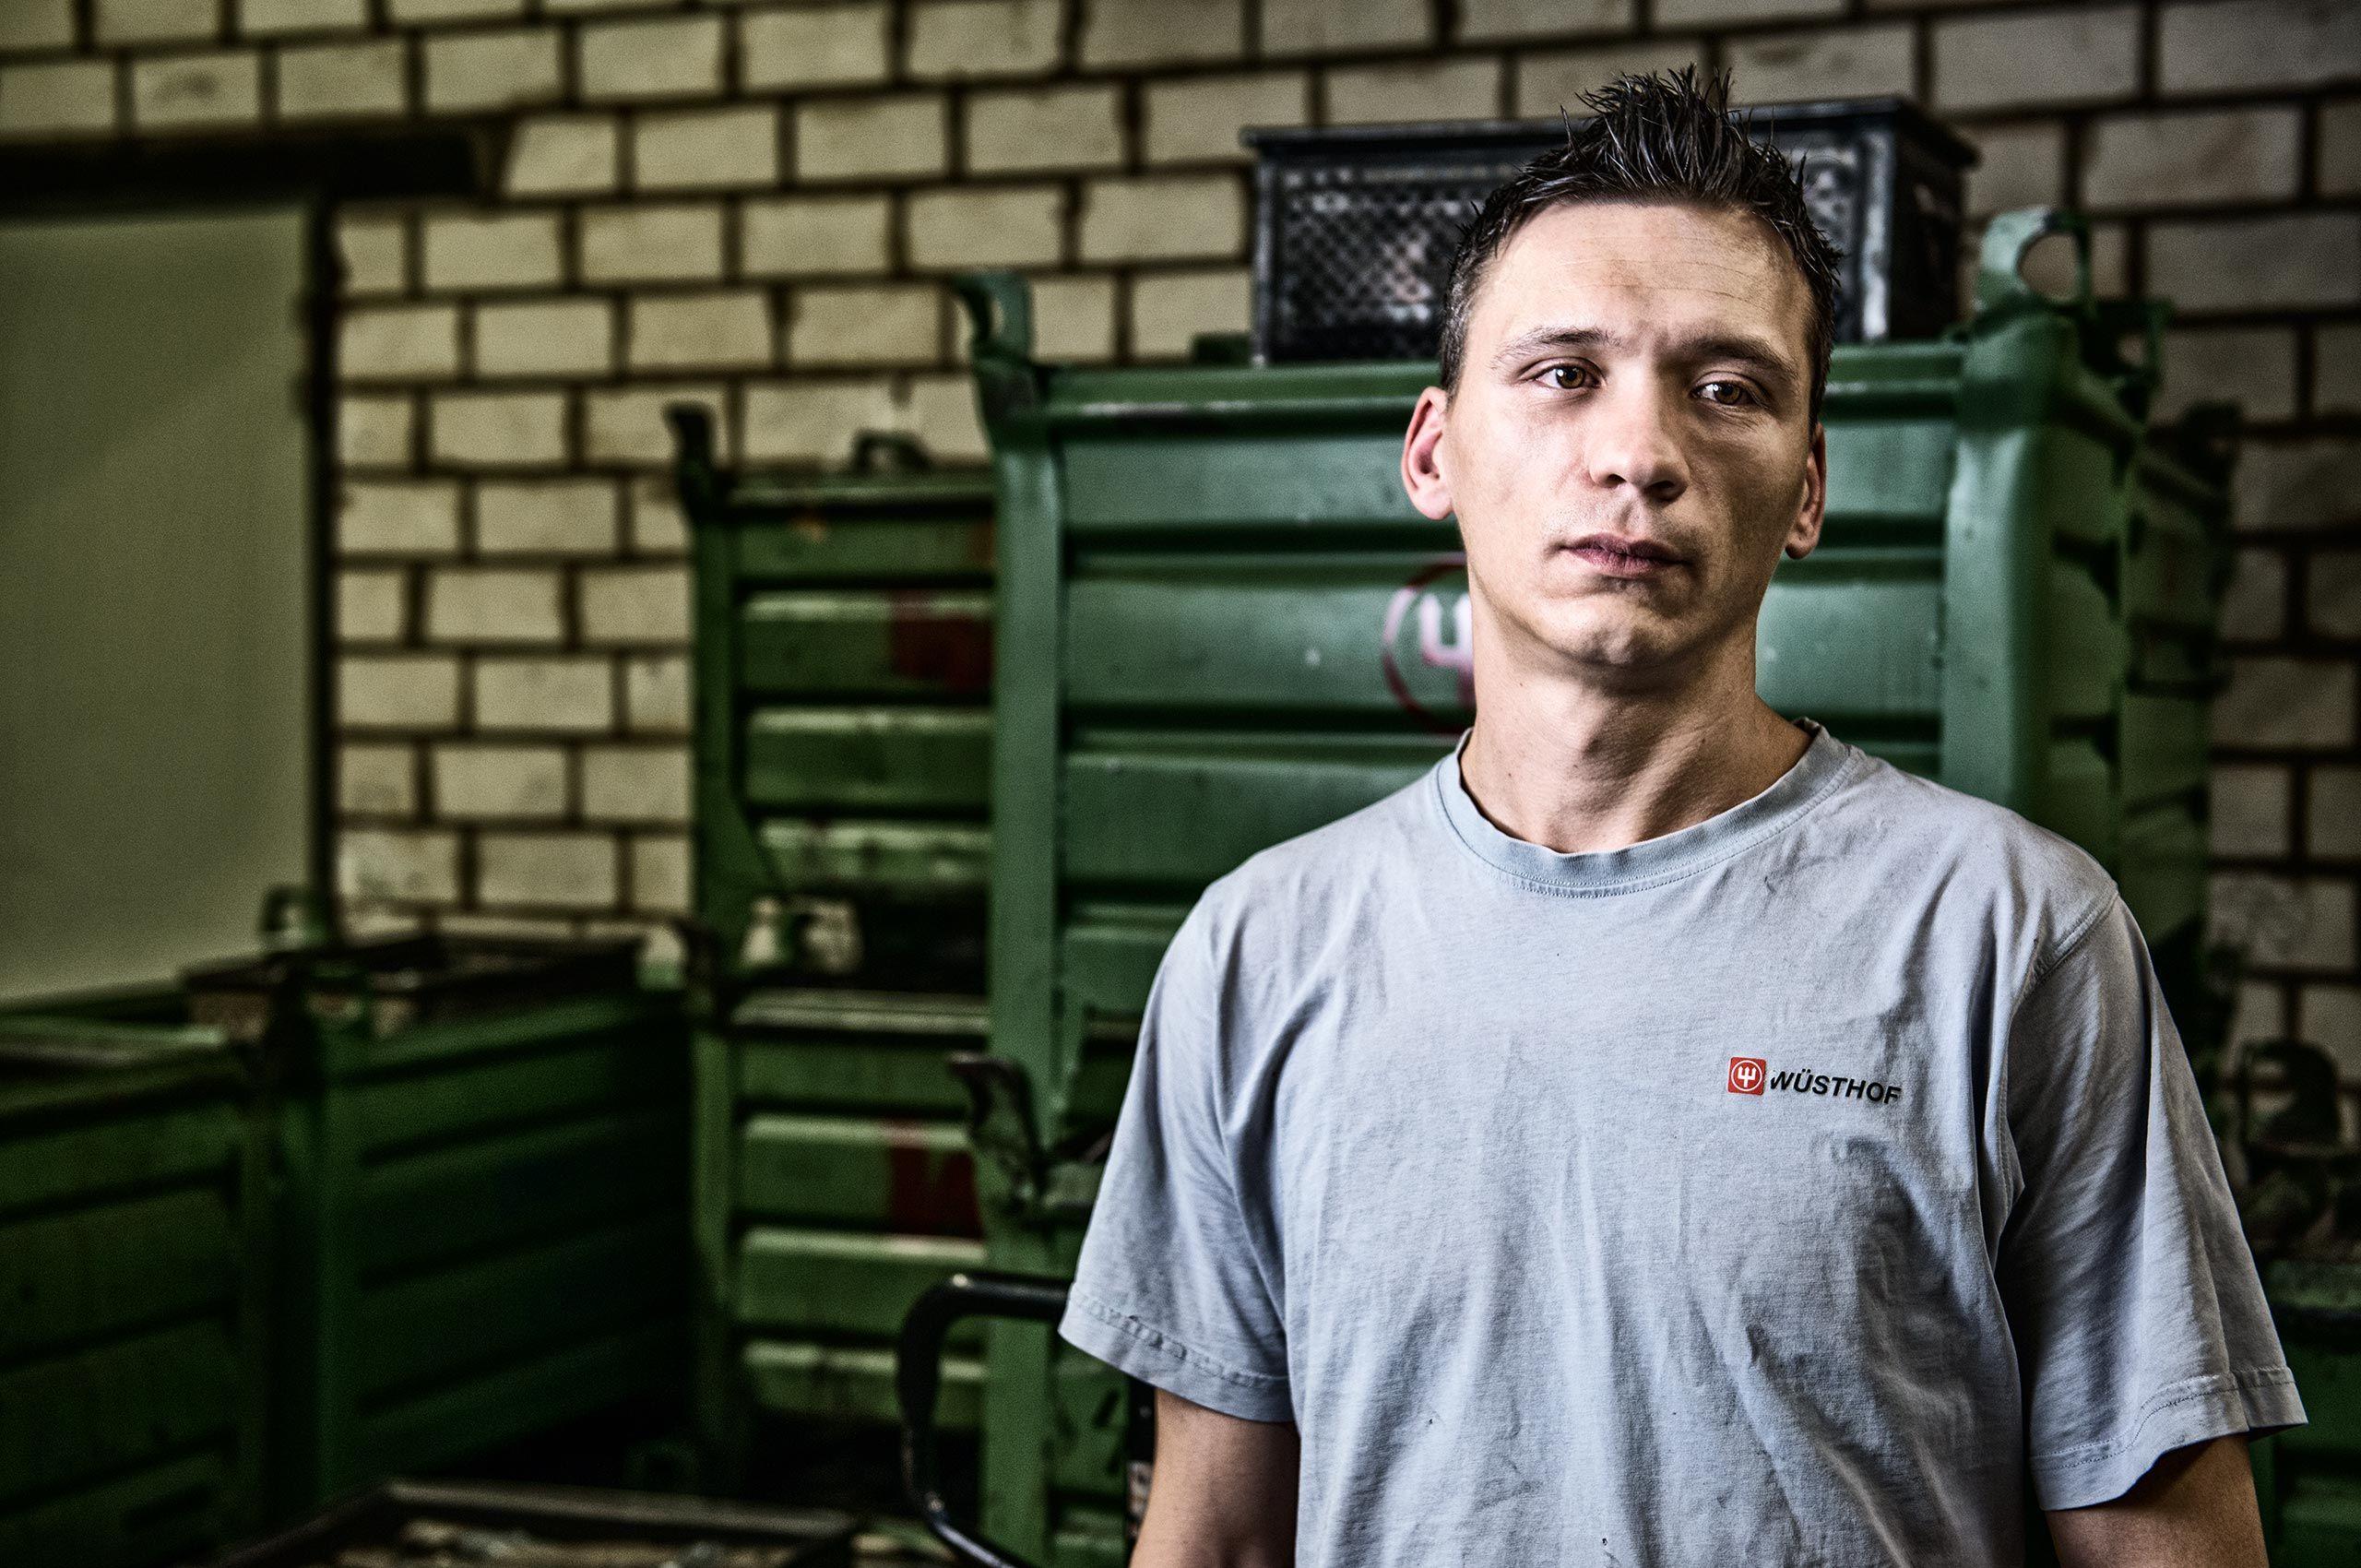 factory-worker-germany-wusthof-factory-HenrikOlundPhotography.jpg